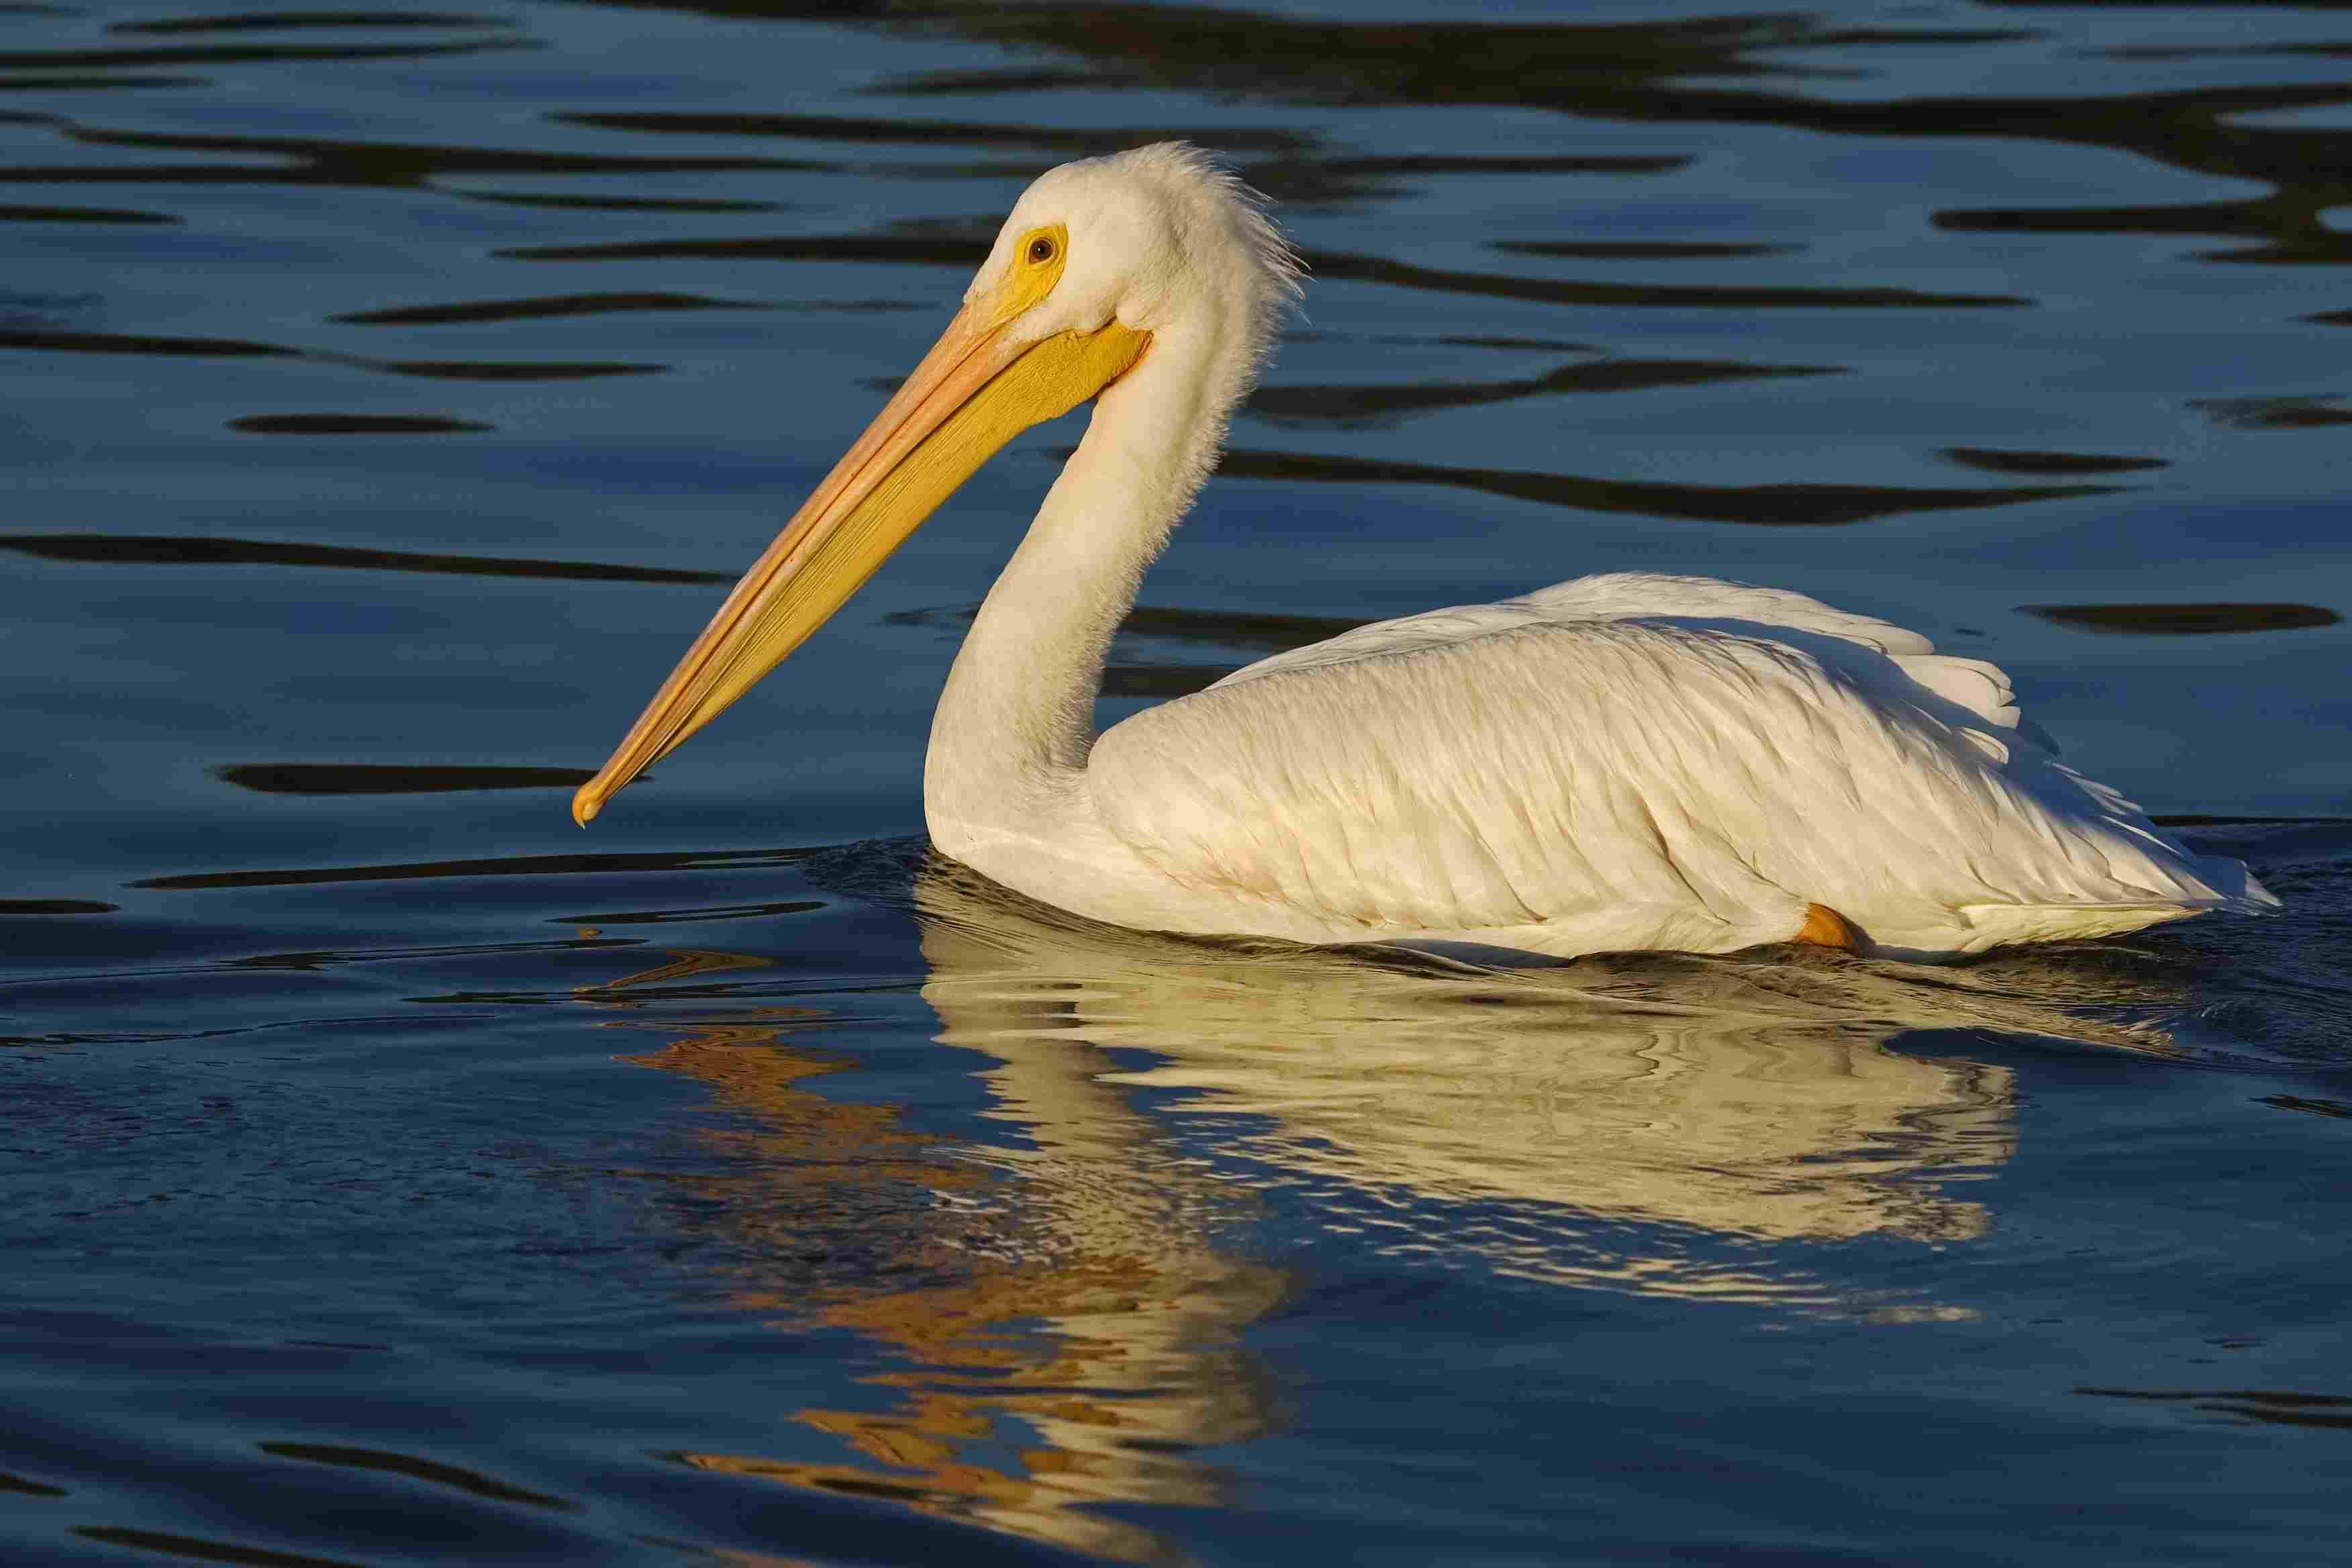 White Pelican at White Rock Lake